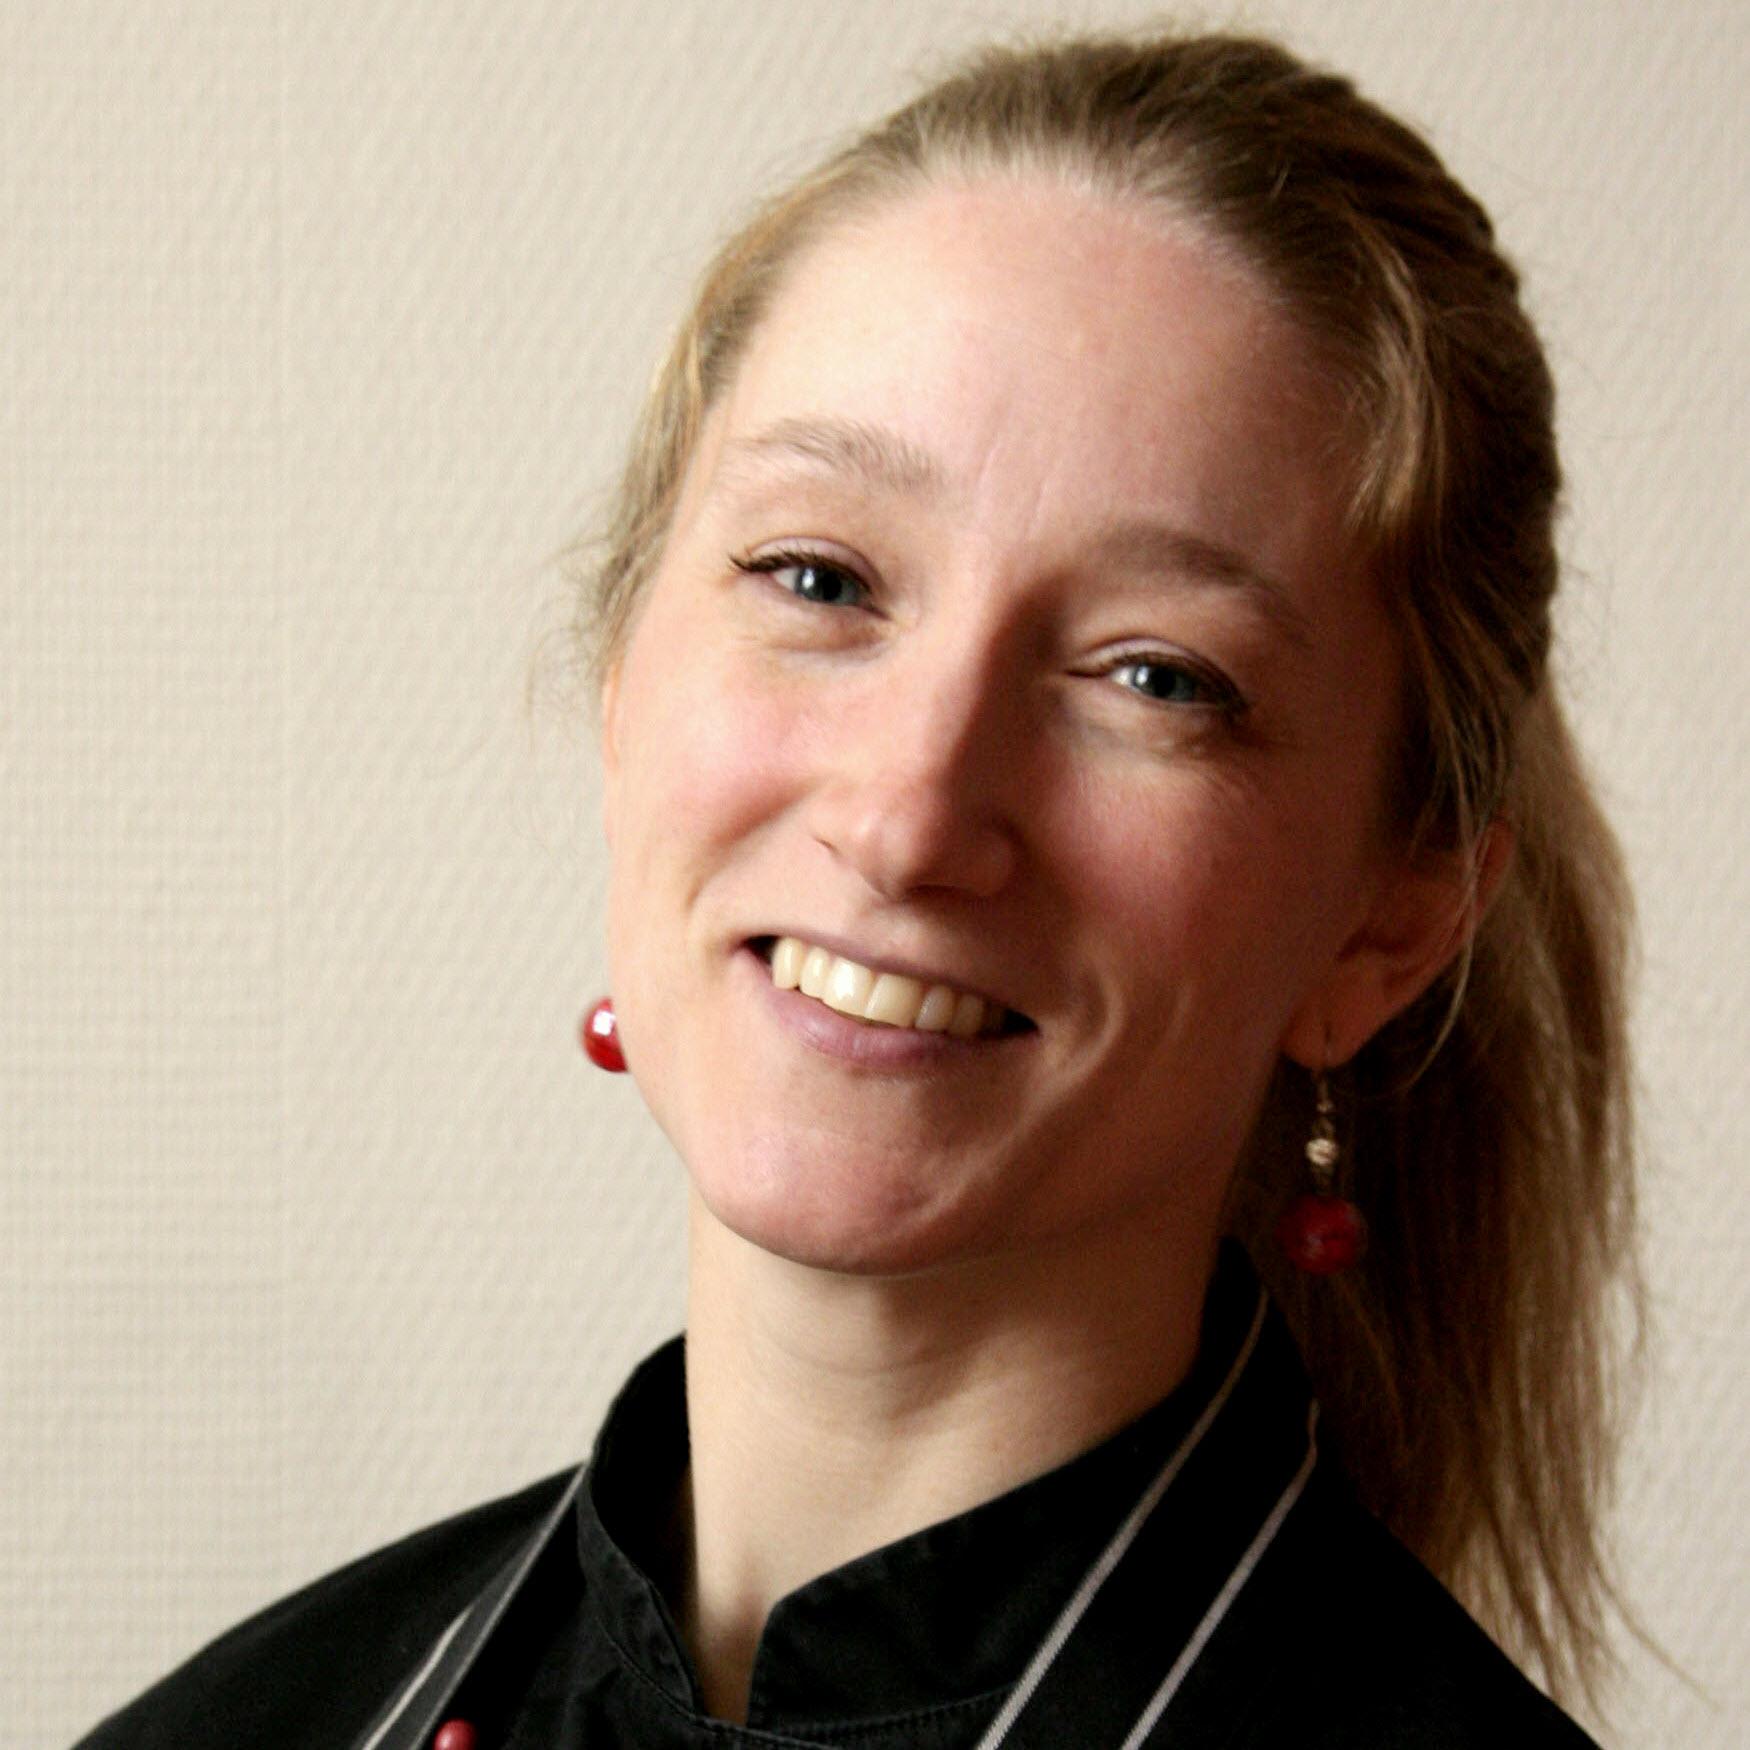 I. (Ingrid) Geel Nilsson